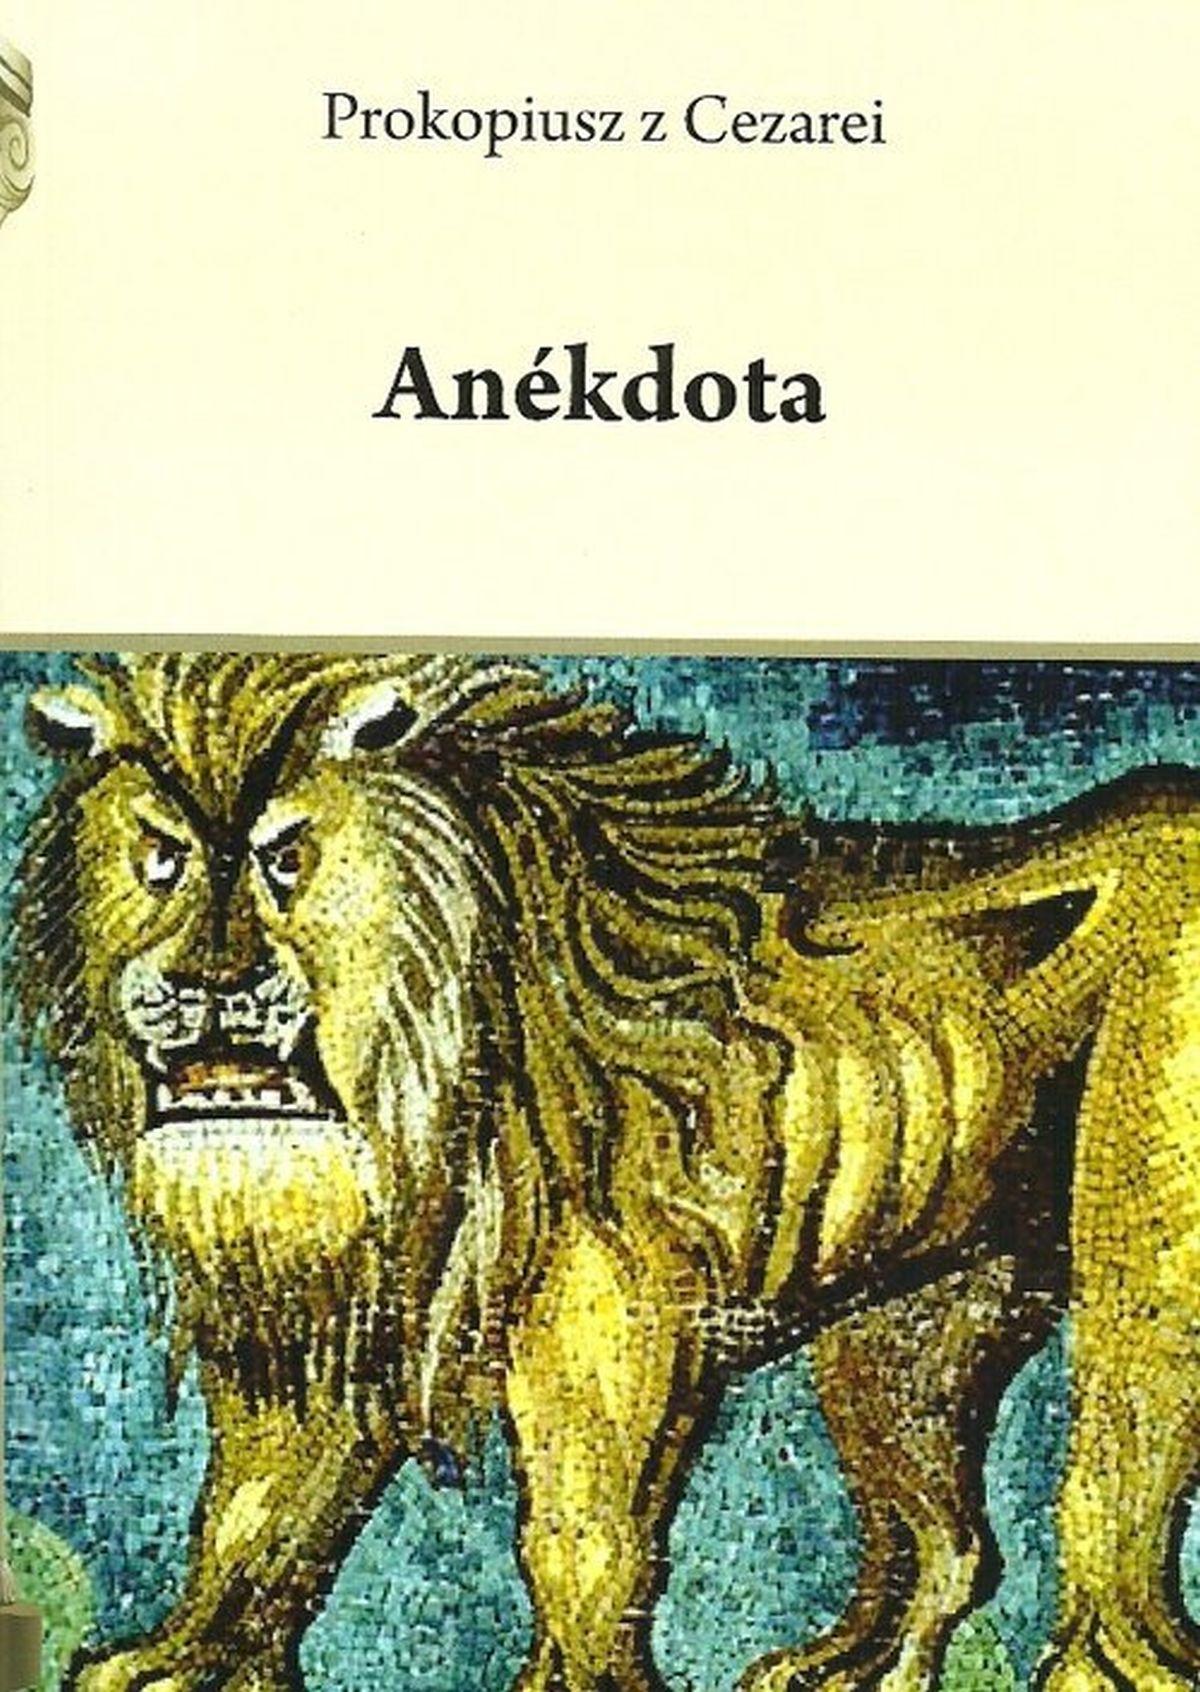 Prokopiusz z Cezarei, Anekdota